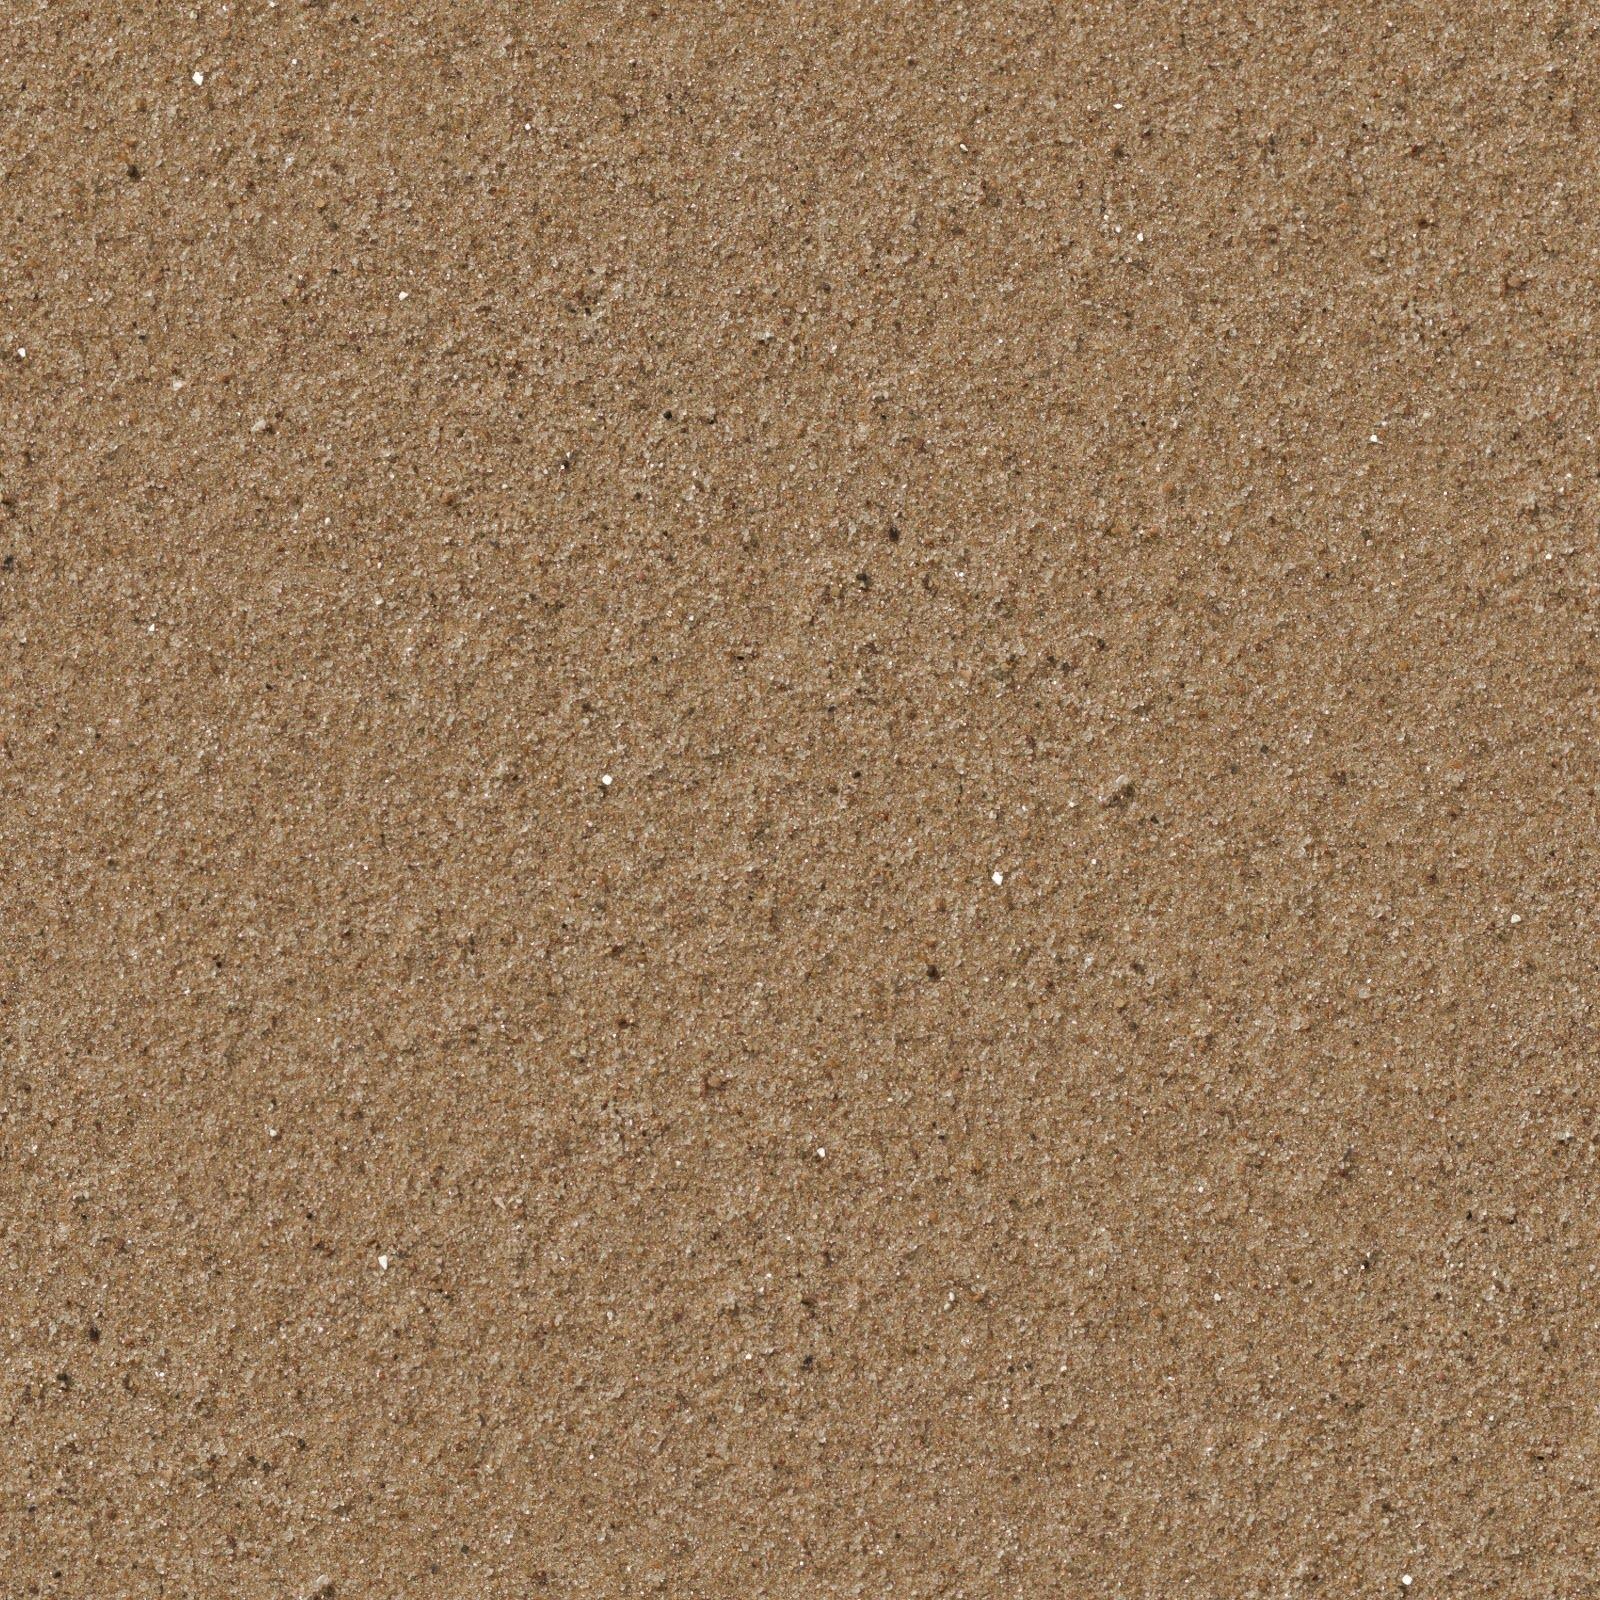 Seamless sand beach soil texture 2048x2048 texture for Soil material